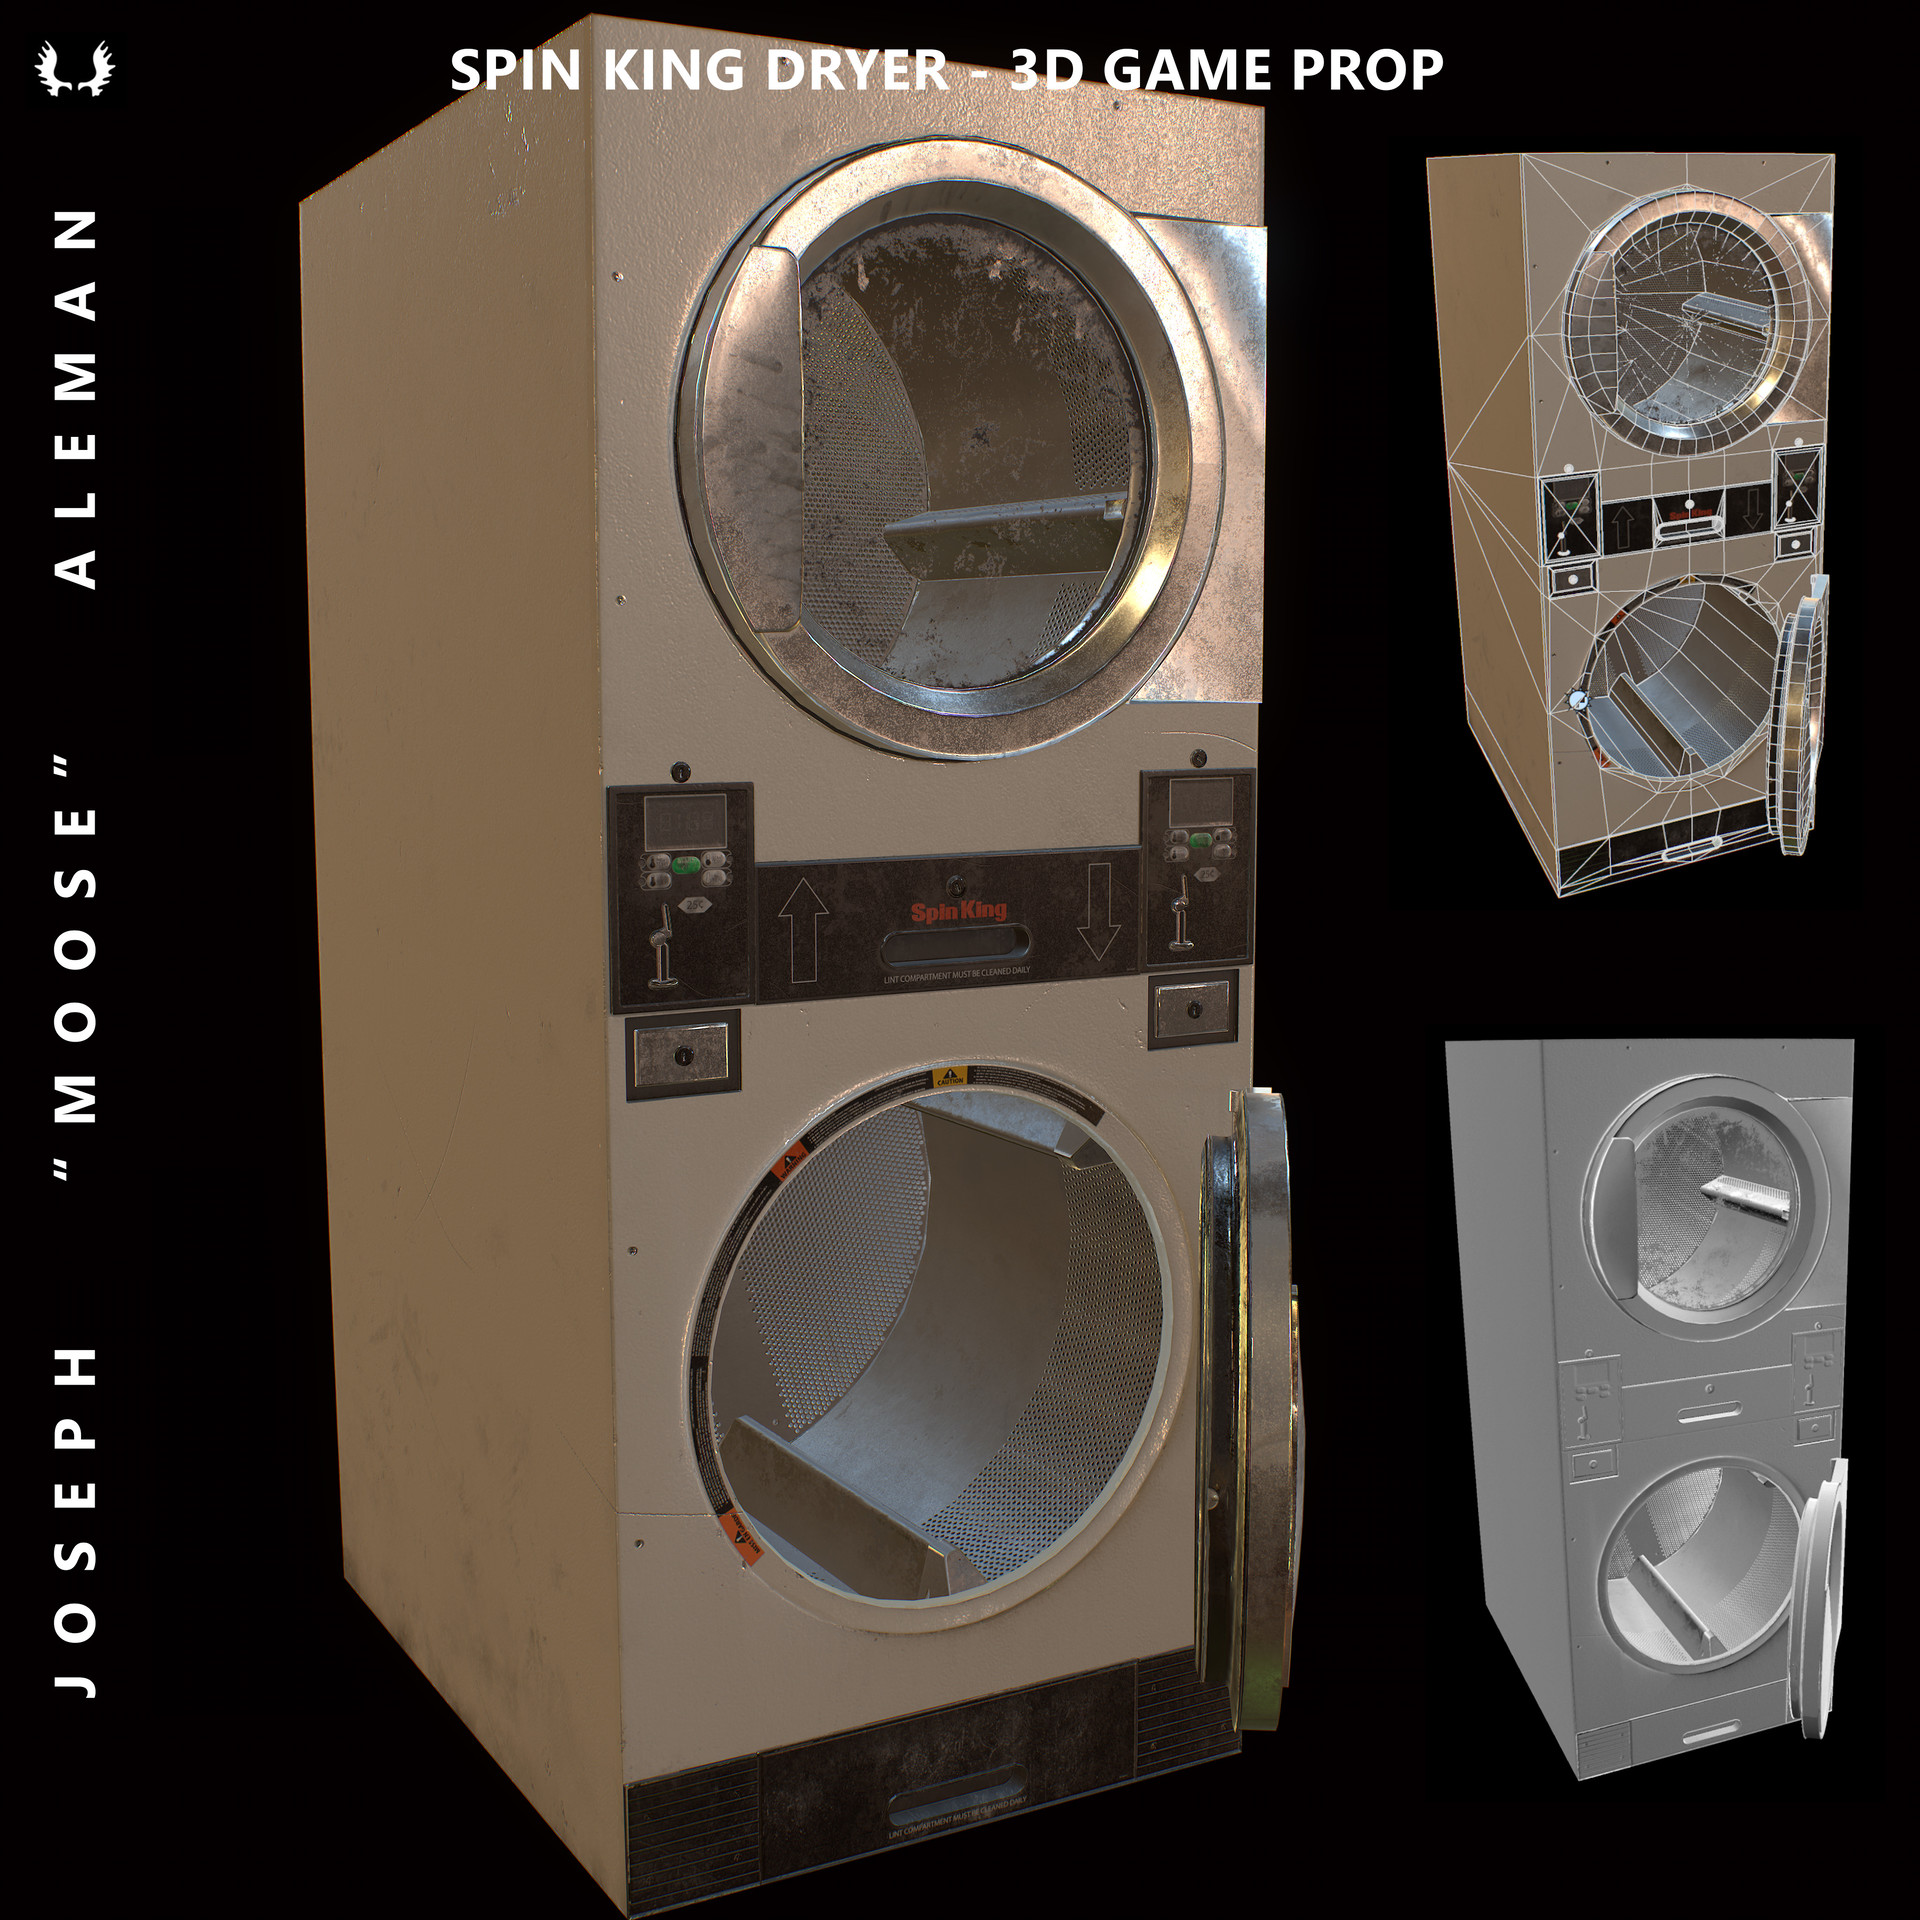 ArtStation - Spin King Dryer - 3d Game Prop, Joseph Aleman